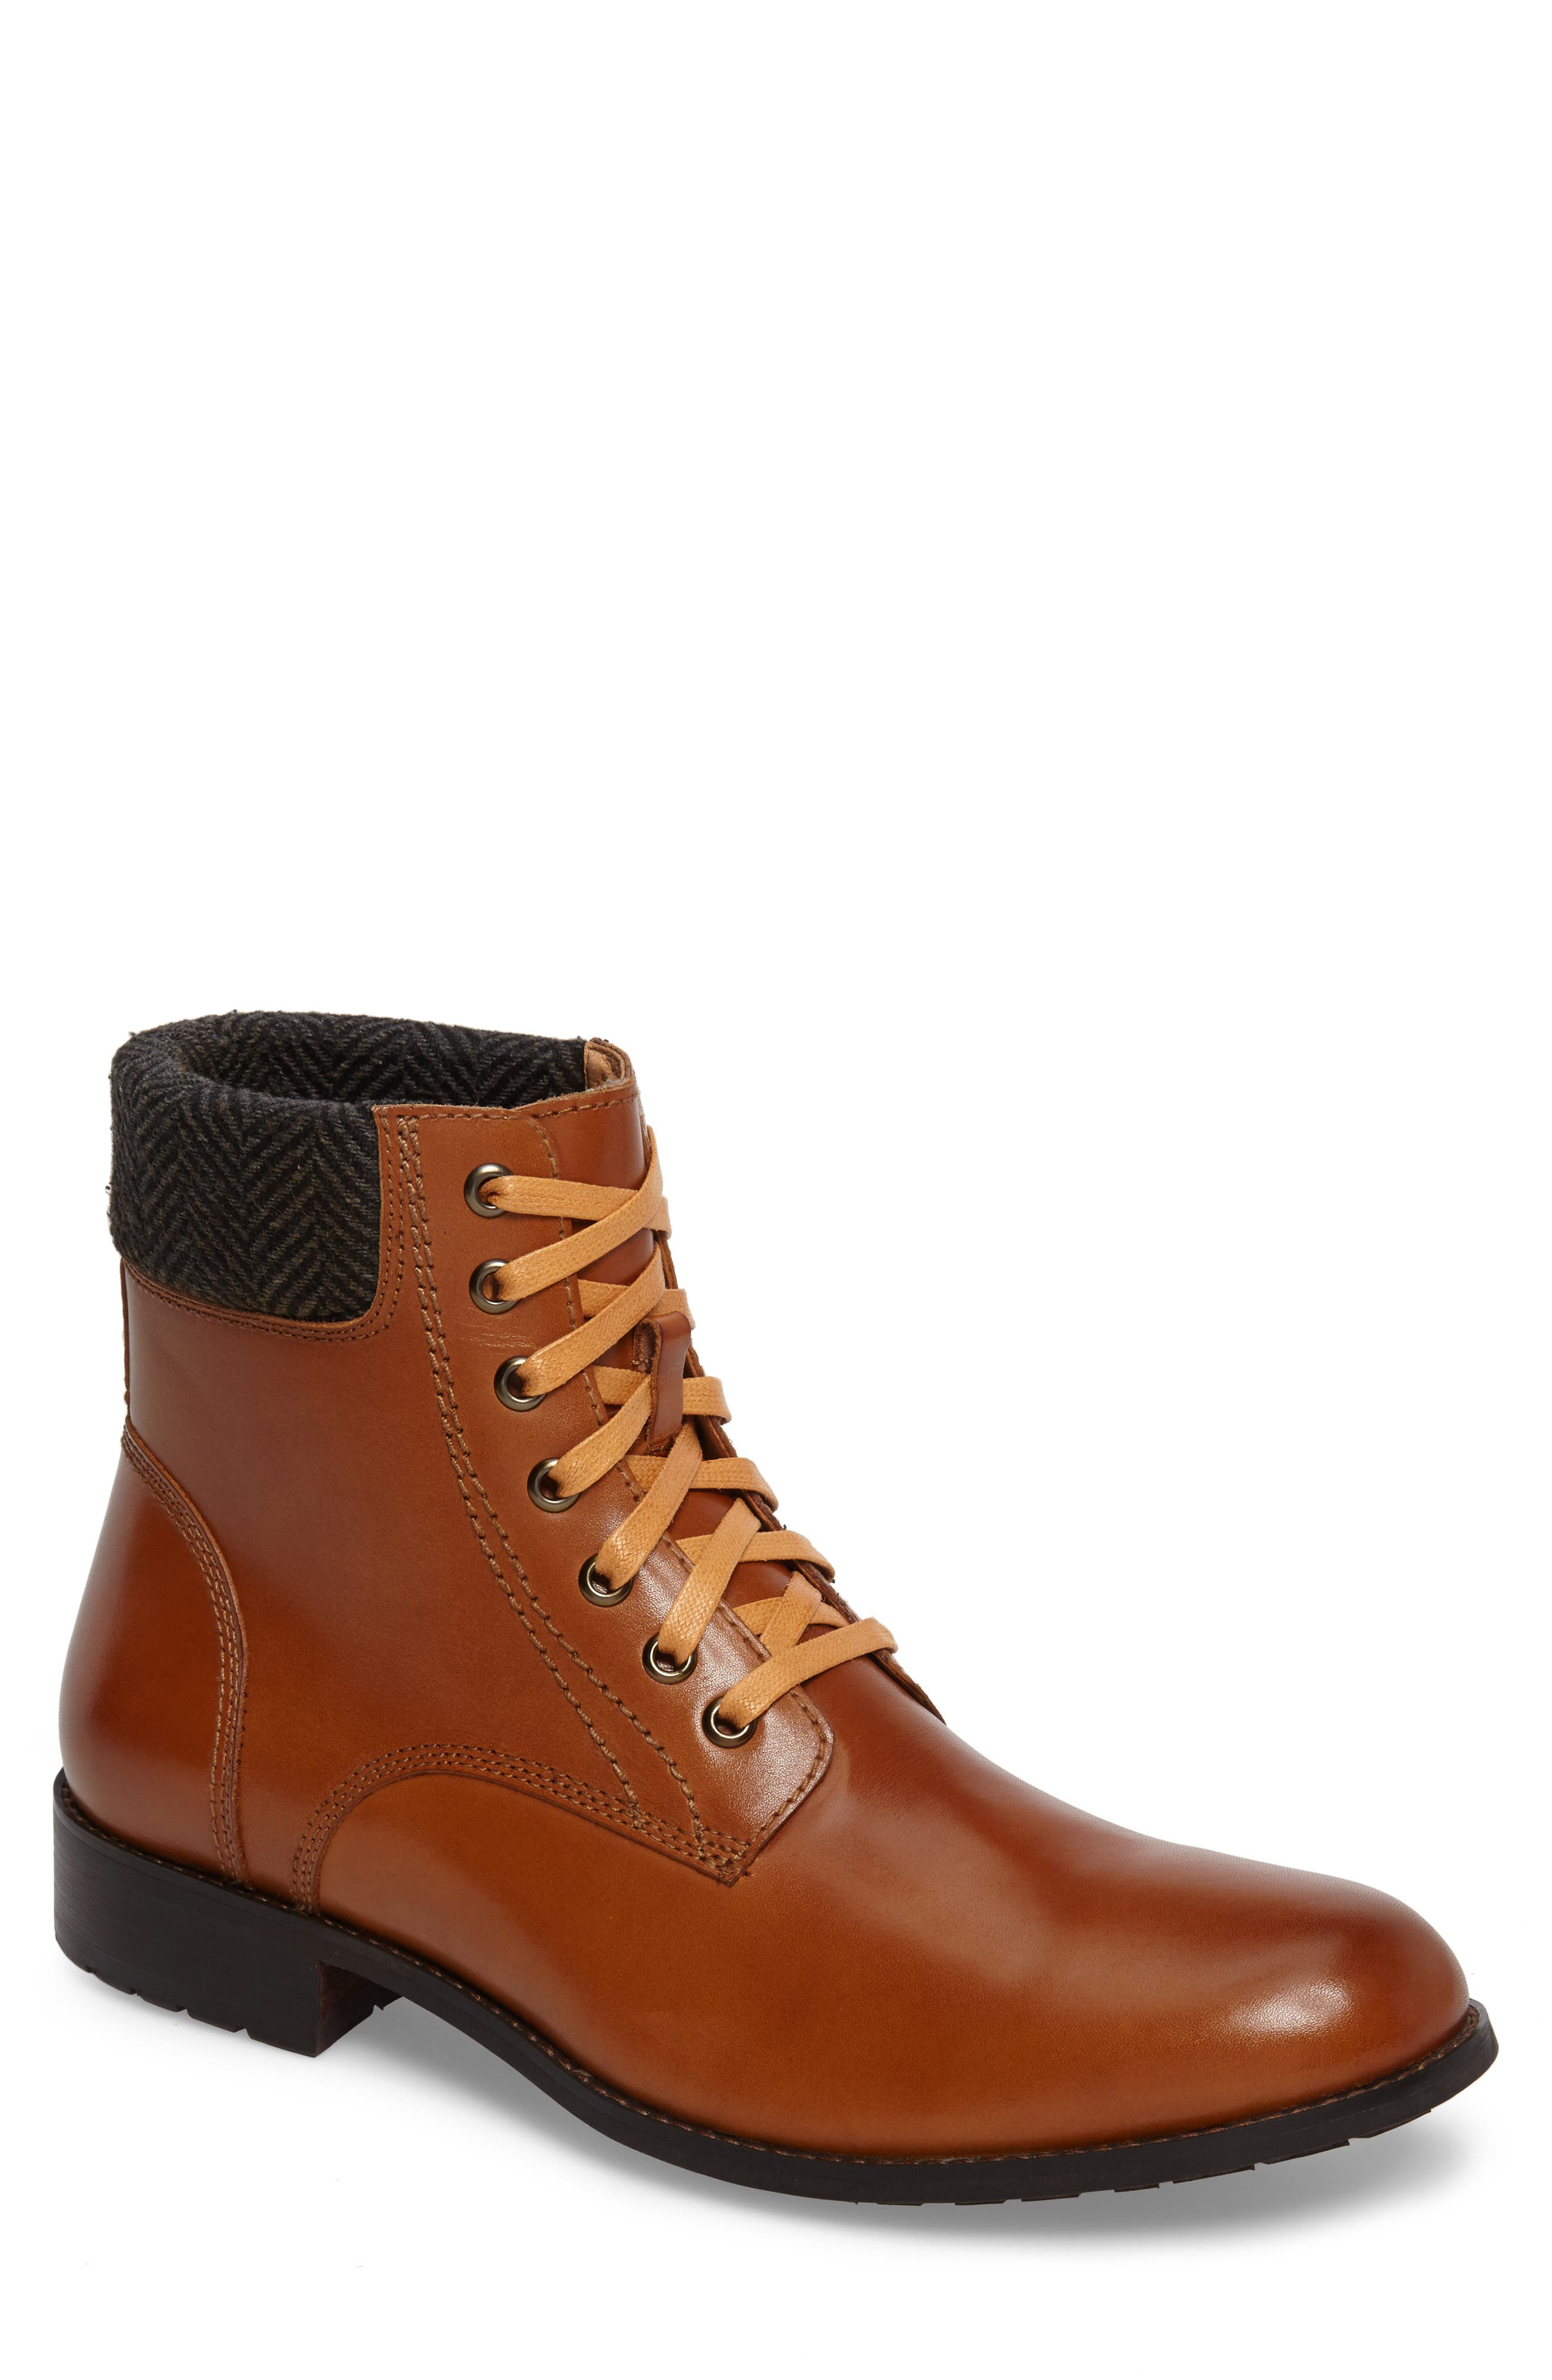 Saar Plain Toe Boot,                             Main thumbnail 1, color,                             Cognac Leather